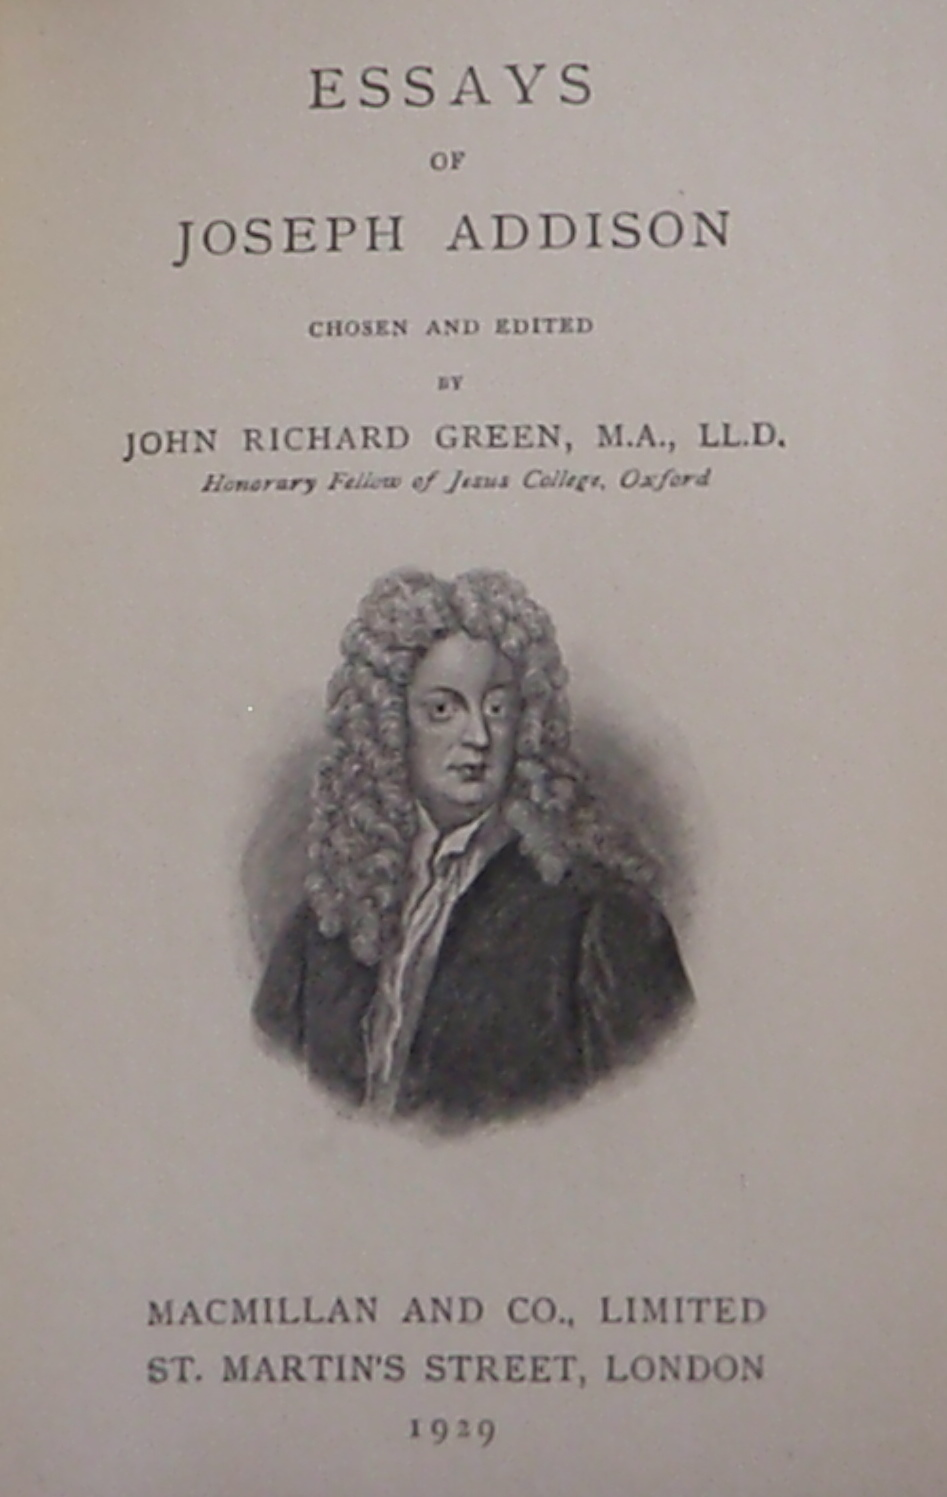 Joseph addison essays analysis